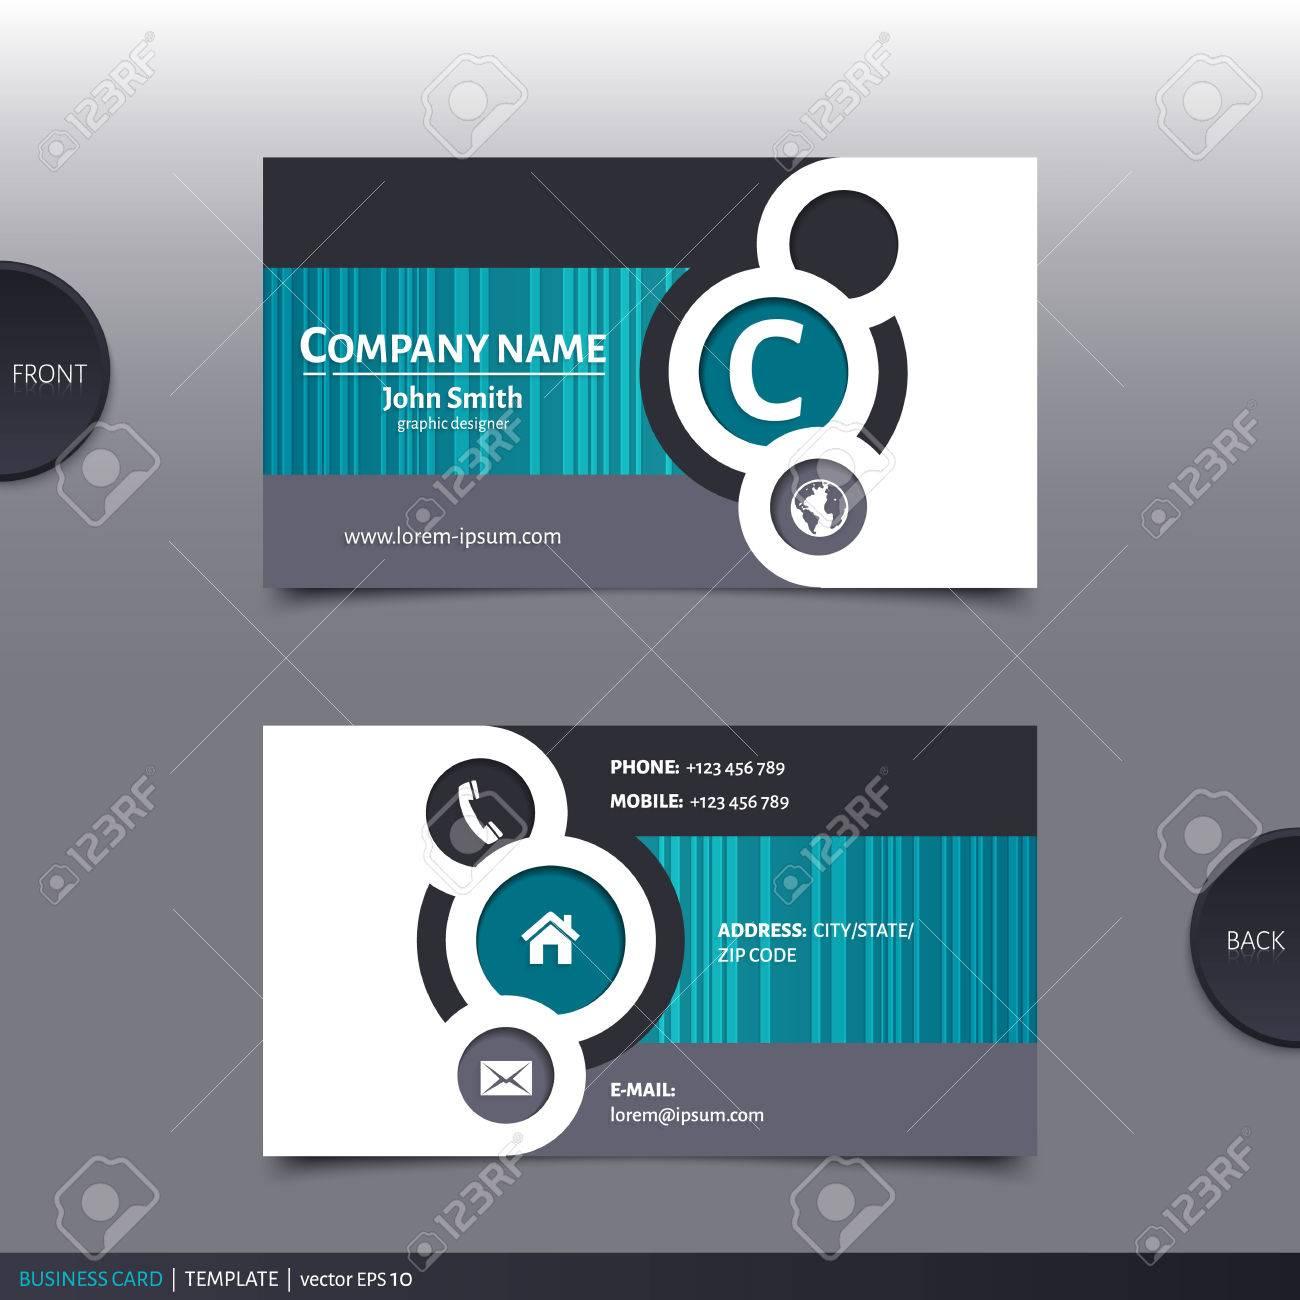 Business card template, modern abstract design. Vector. - 33444713